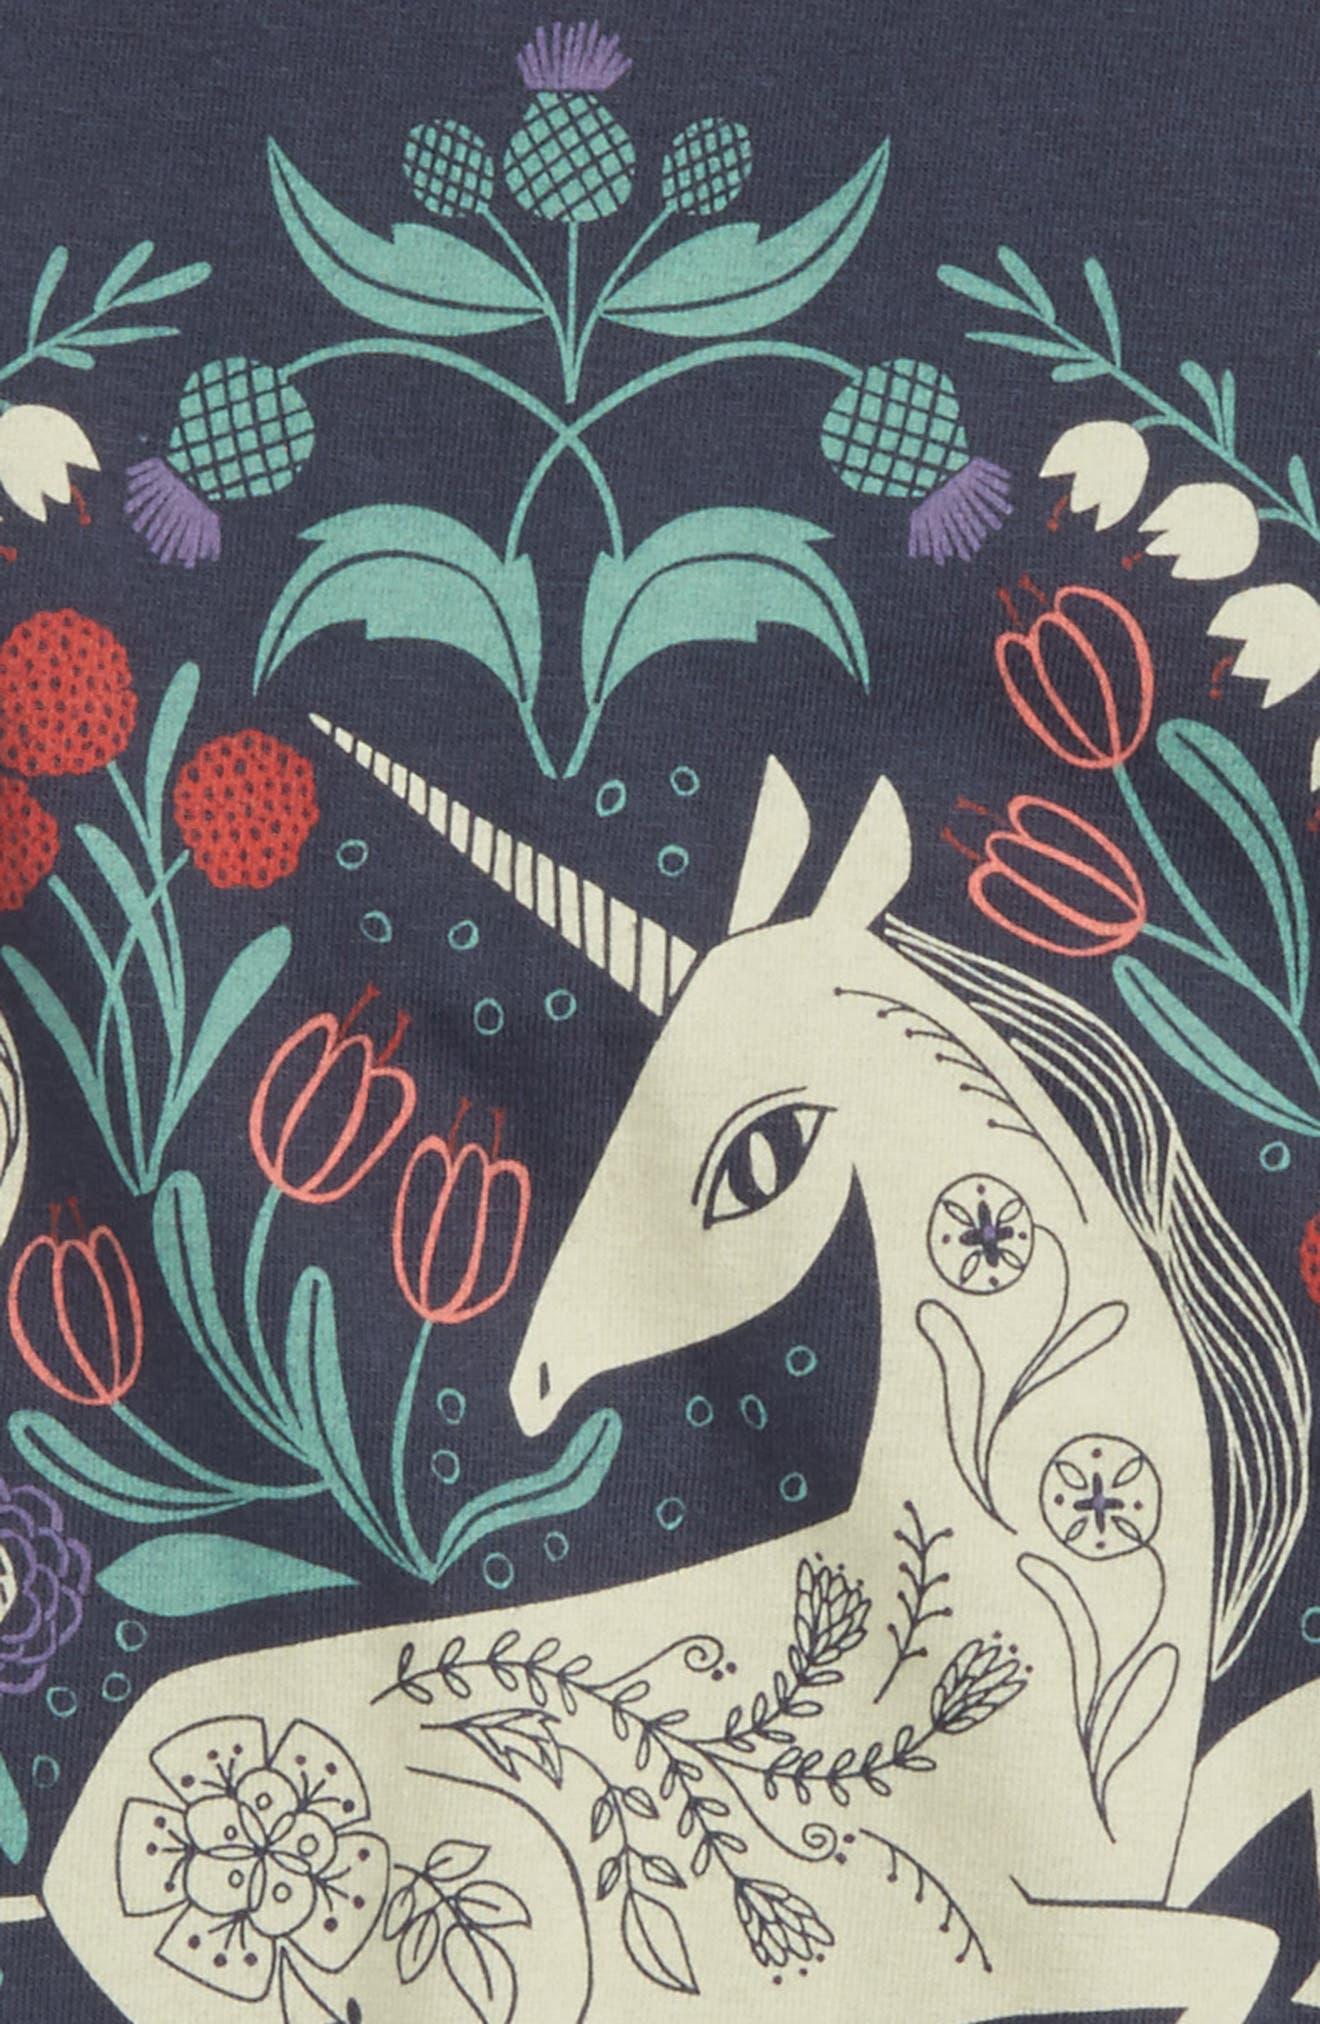 Unicorn Graphic Top,                             Alternate thumbnail 2, color,                             400